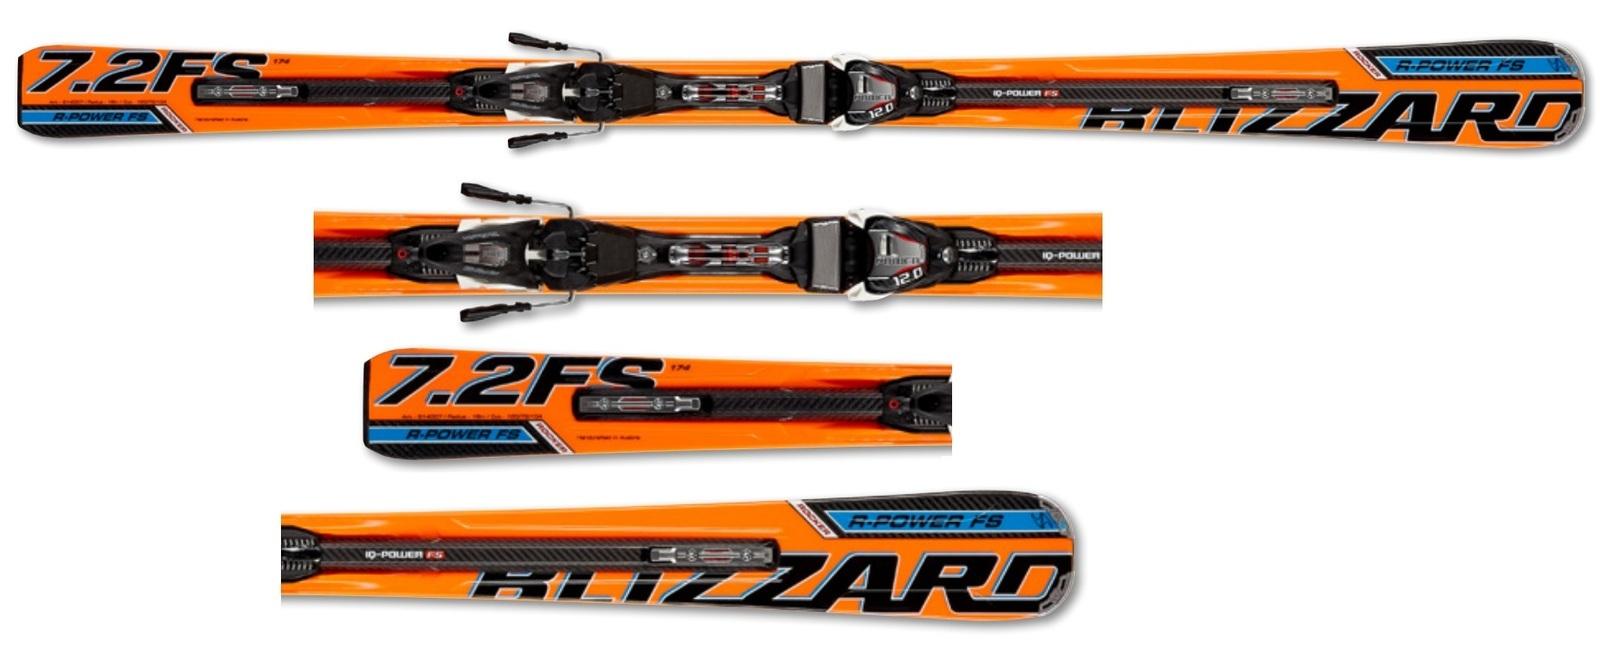 Narty Blizzard R-Power Full Suspension IQ